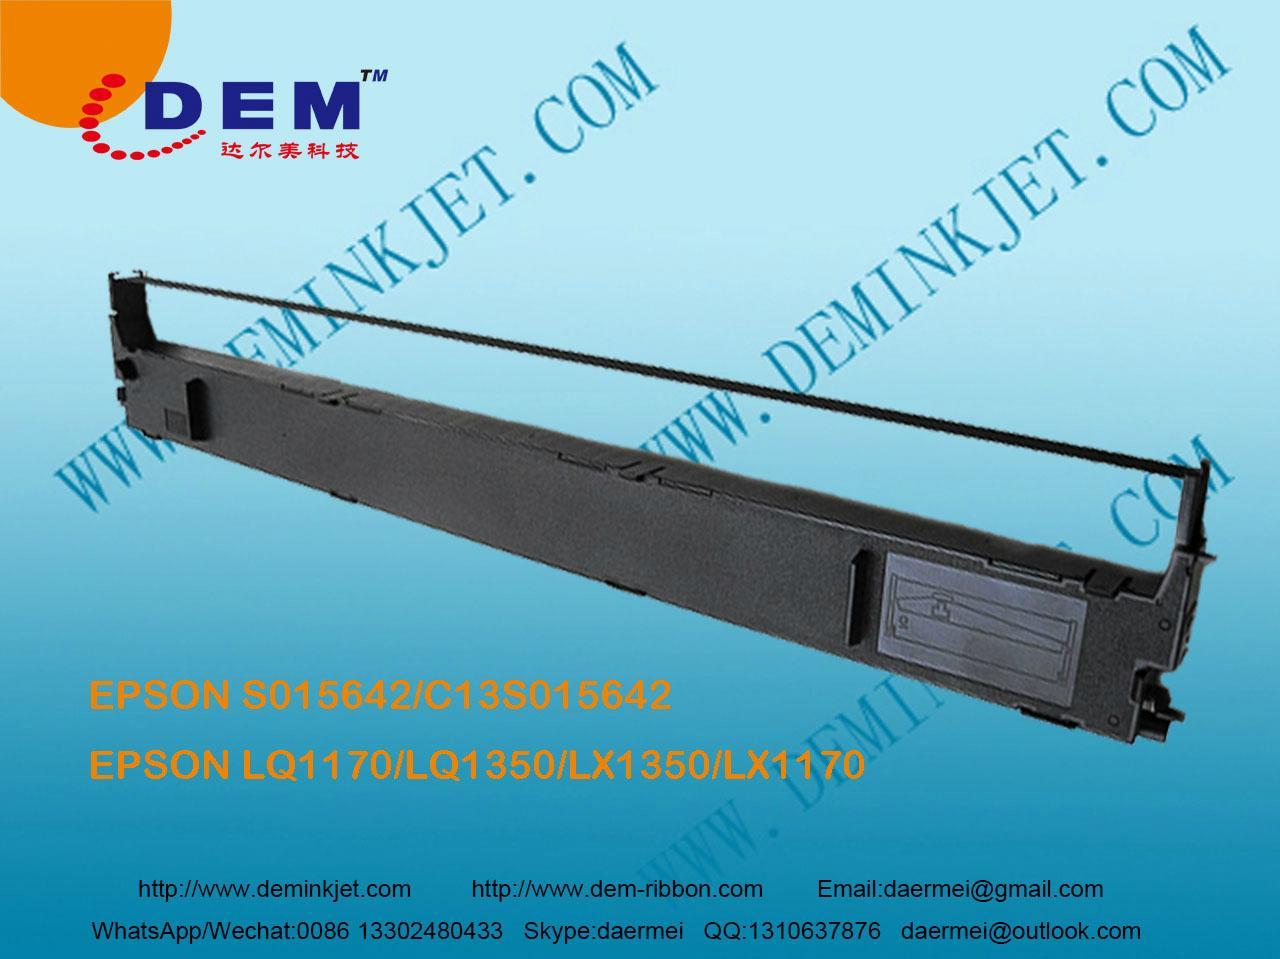 EPSON S015642/C13S015642/LQ1350/LQ1170/LX1350/LX1170